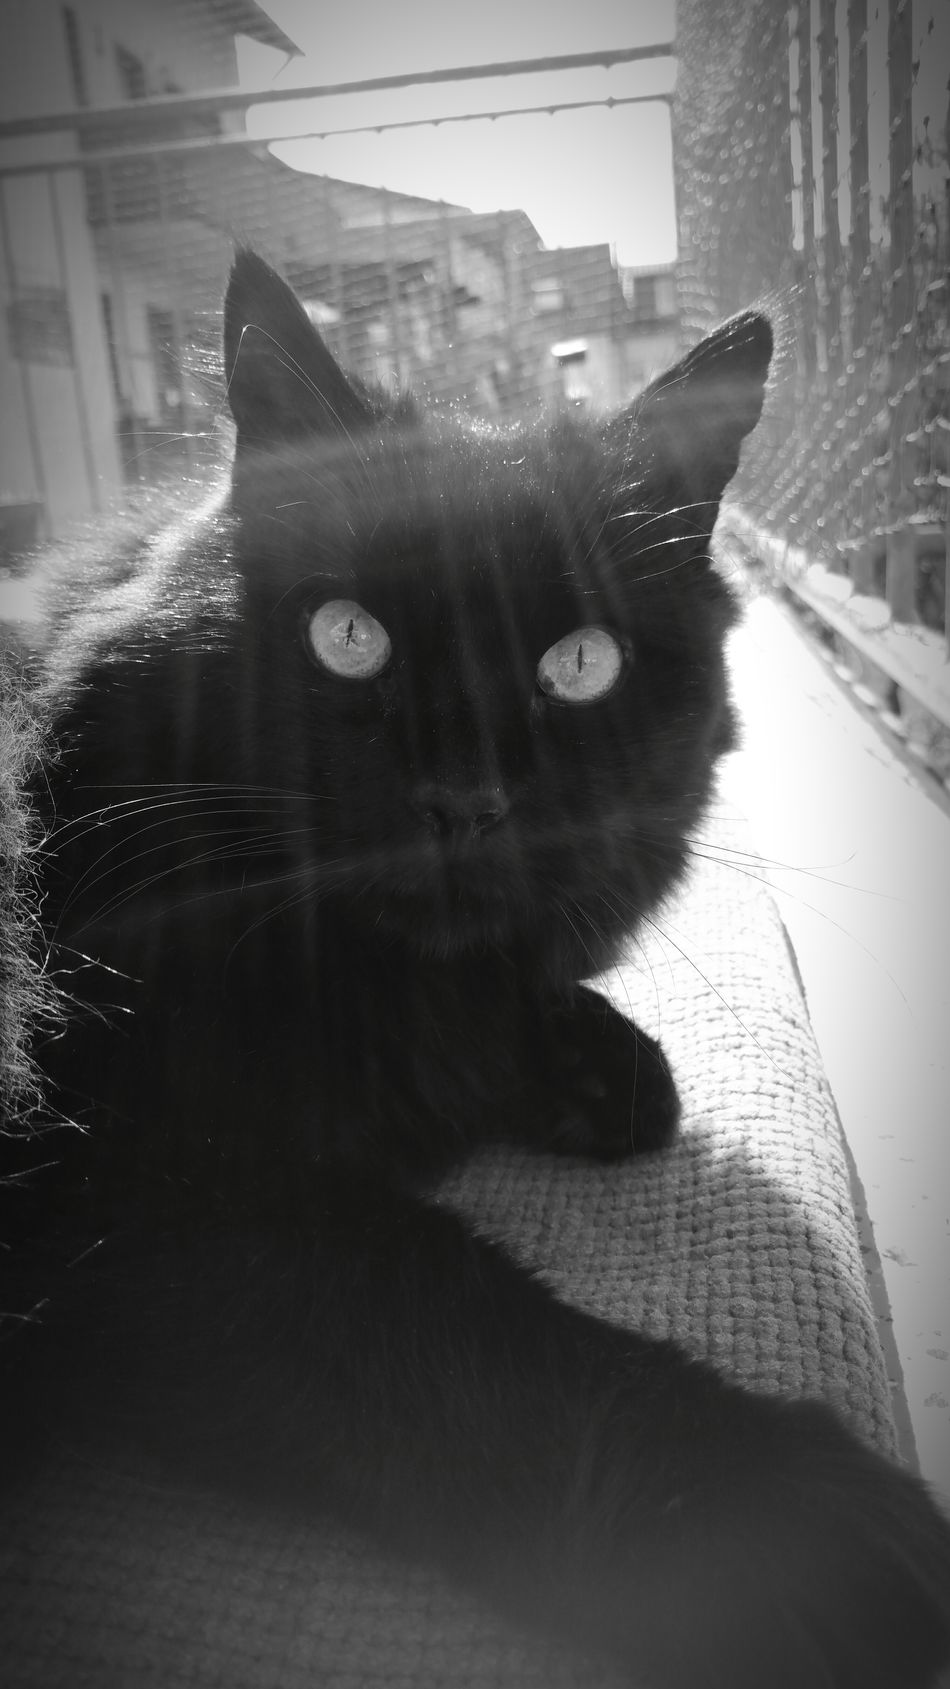 BLackCat Cat Catface Springtime Close-up Spring Animals Lovemycat Bw Blackandwhite Sunrays Sunlight Sunny Day